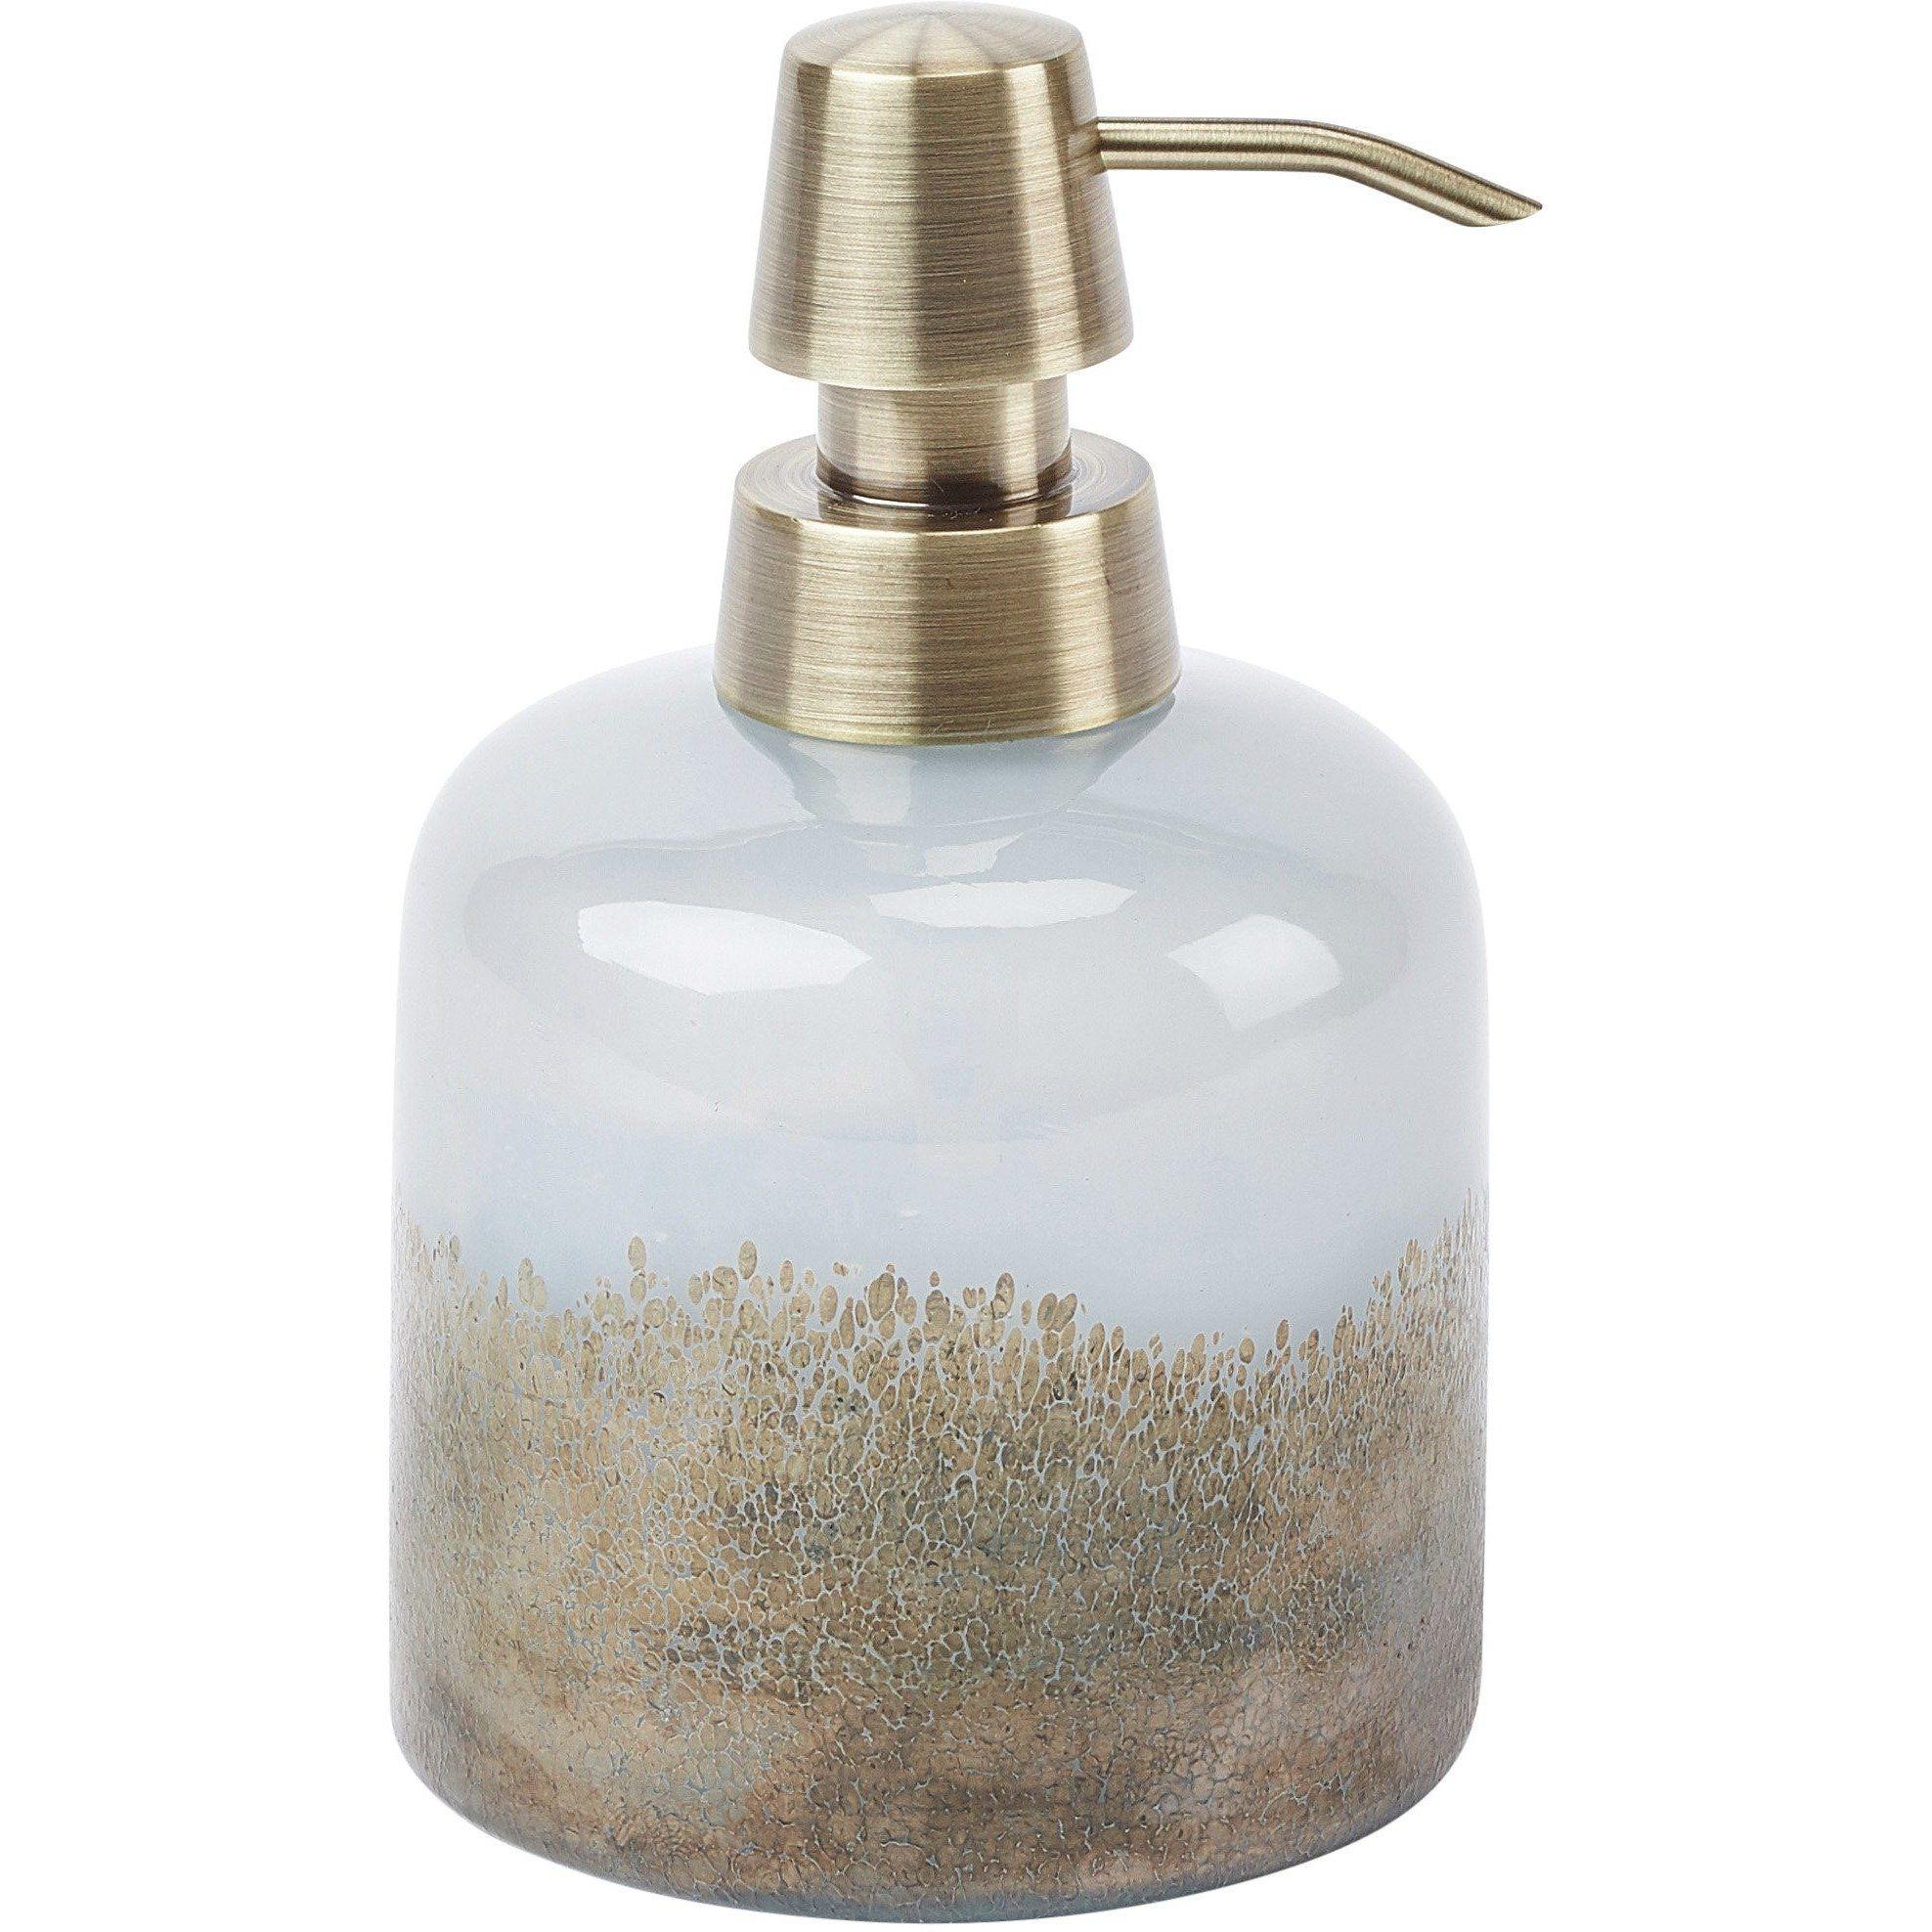 Fyra Round Bathroom Or Kitchen Pump Liquid Soap Lotion Dispenser